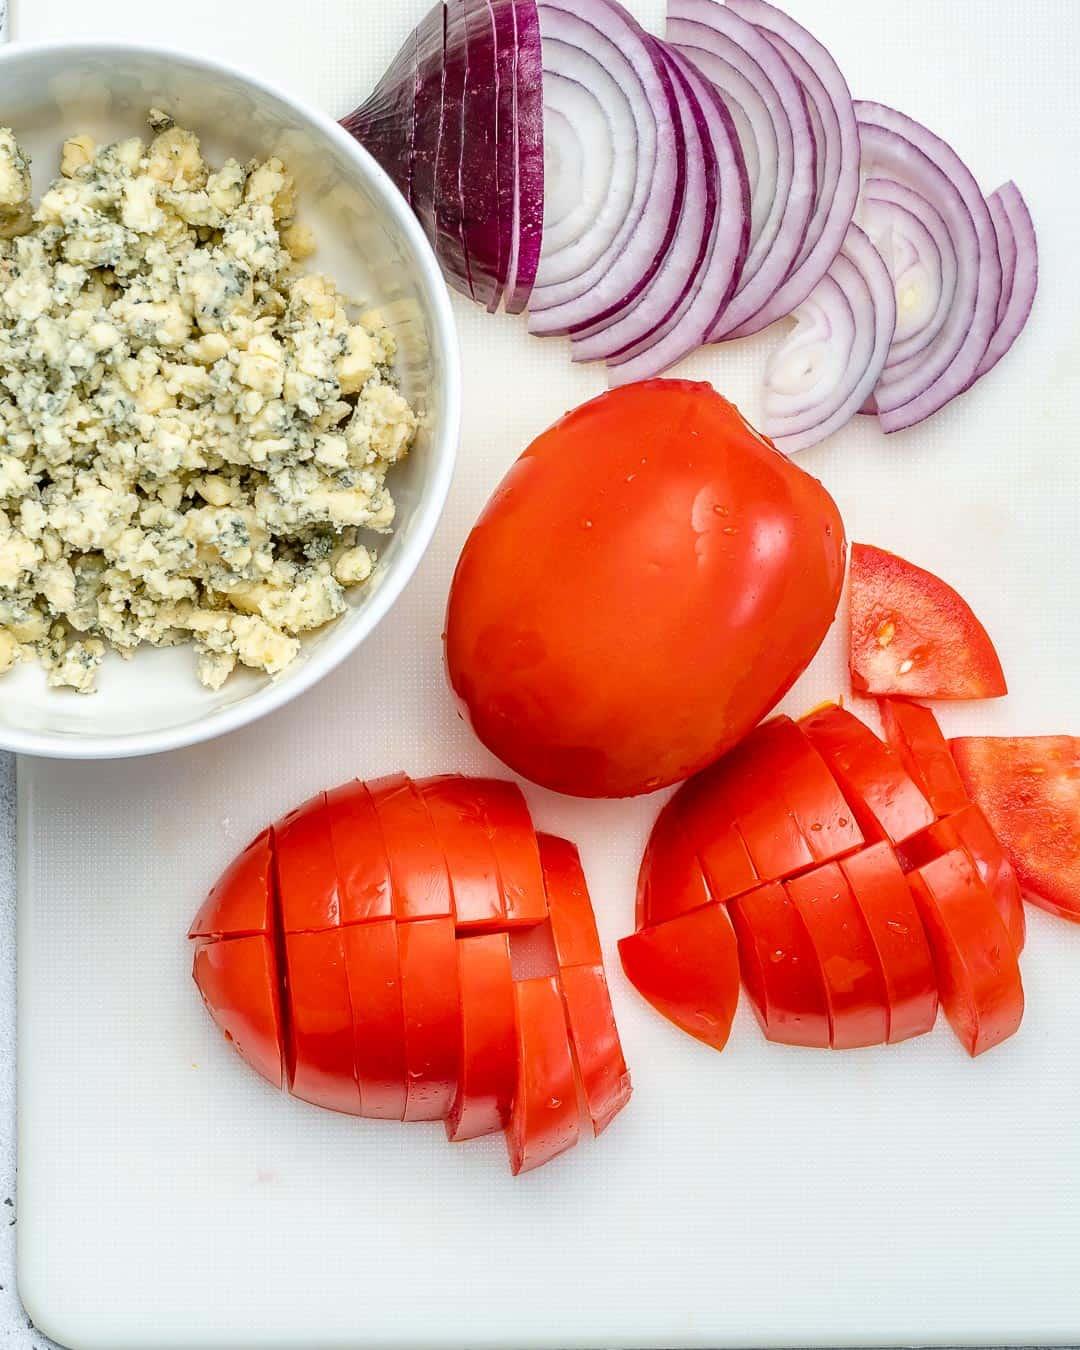 ingredients for Steak Salad Recipe